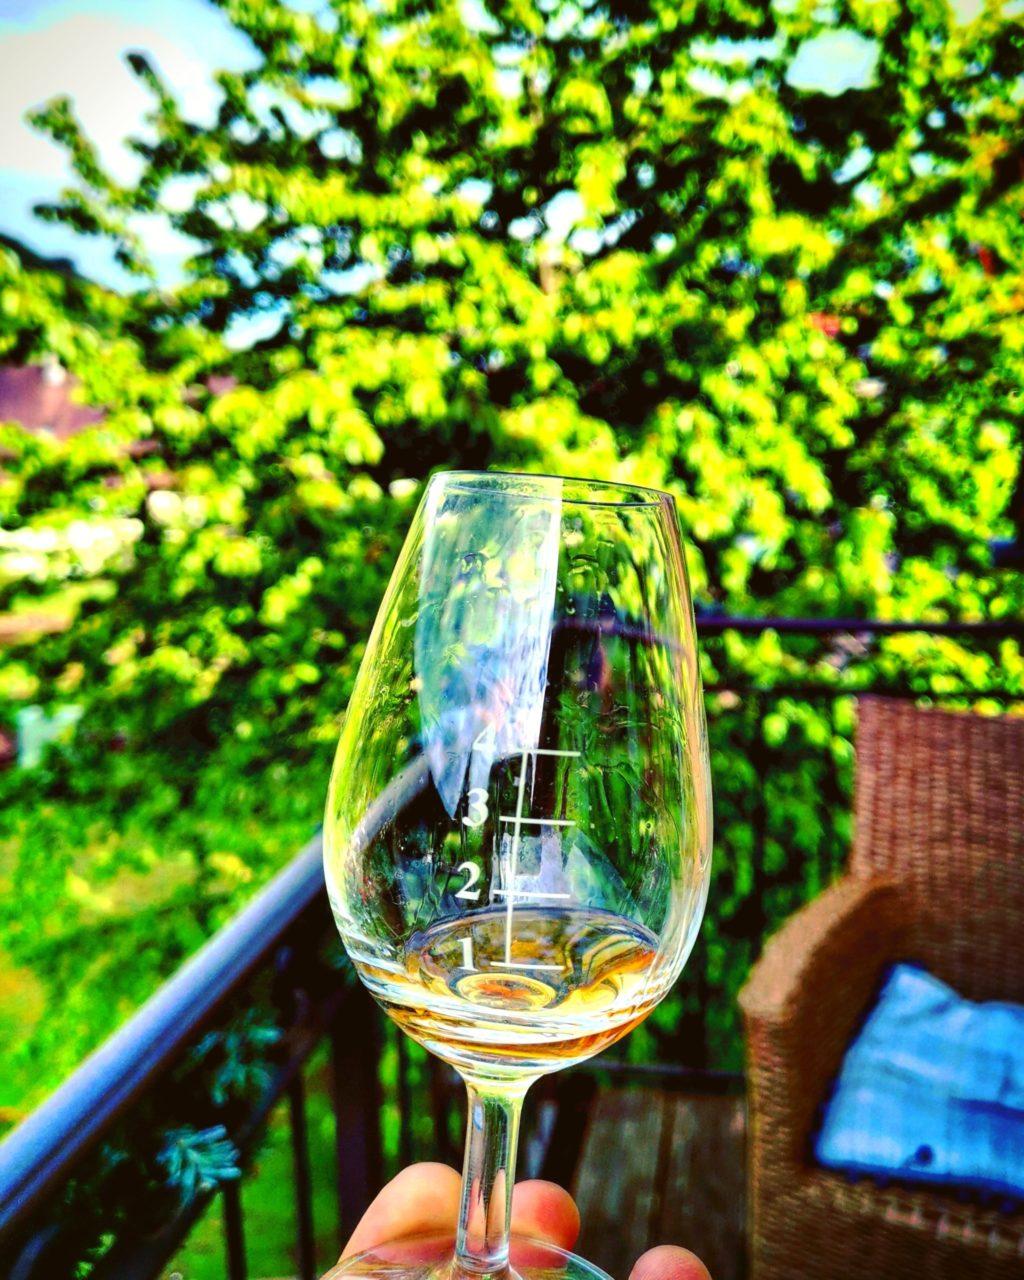 Nosingglas mit Whisky